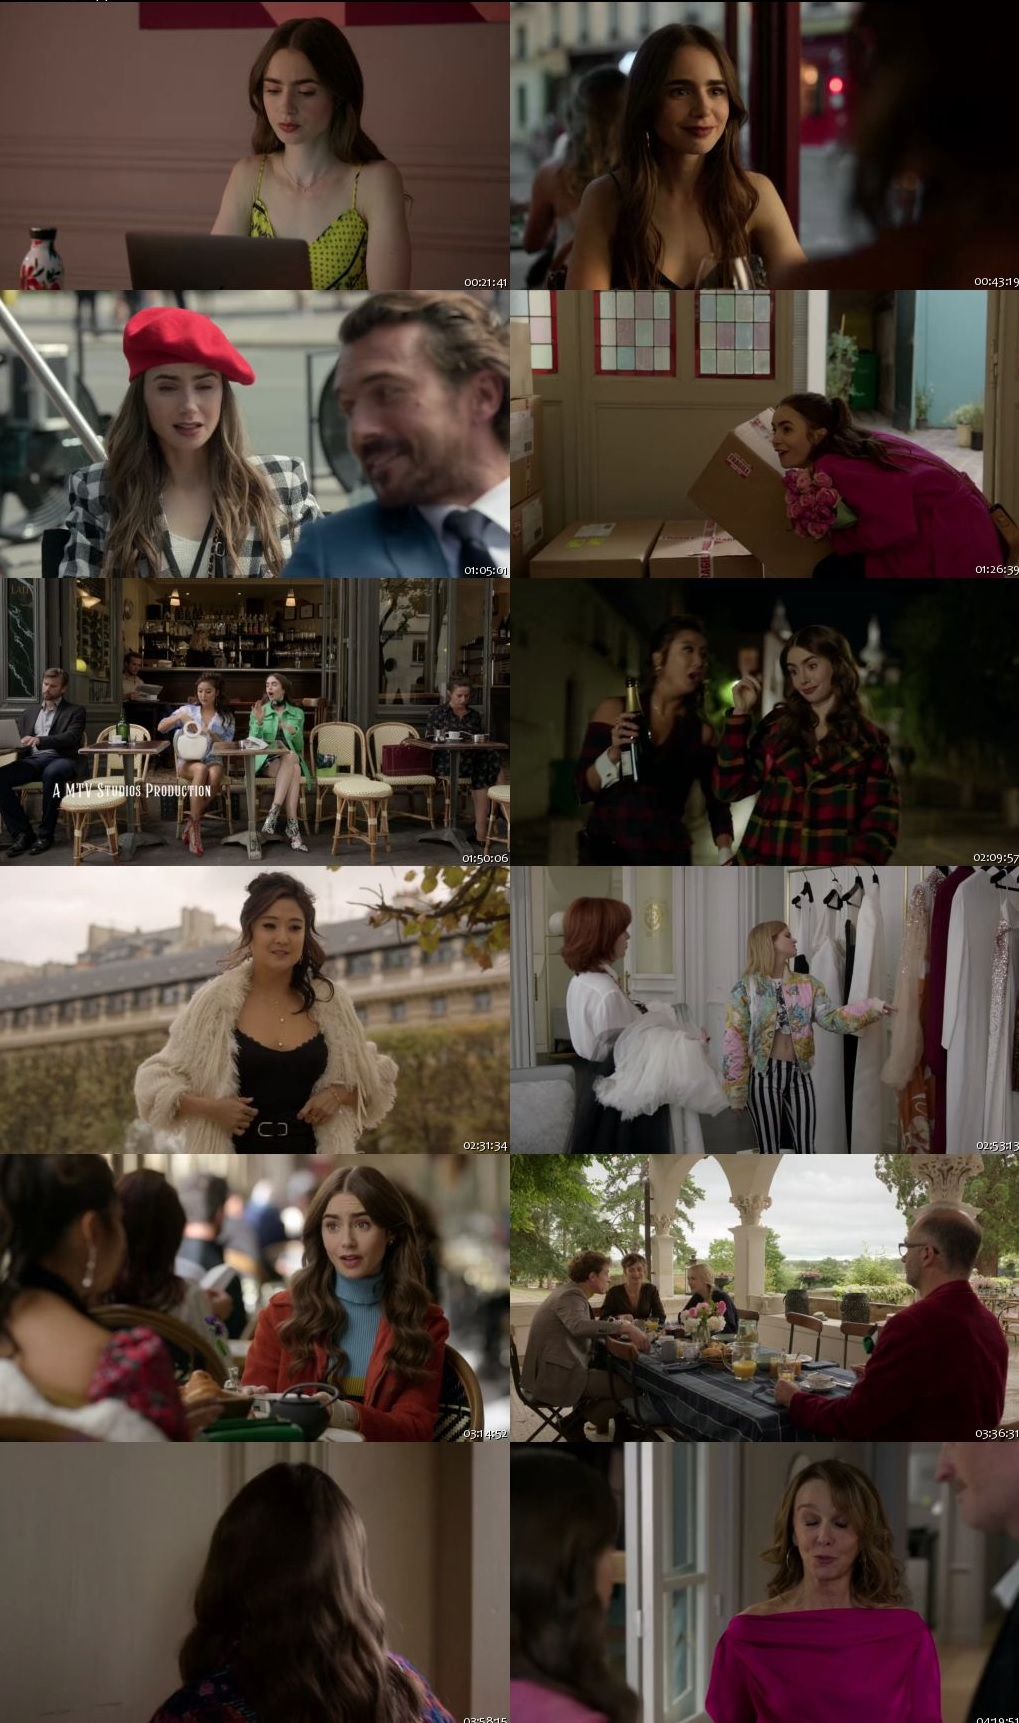 Emily in Paris 2020 (Season 1)